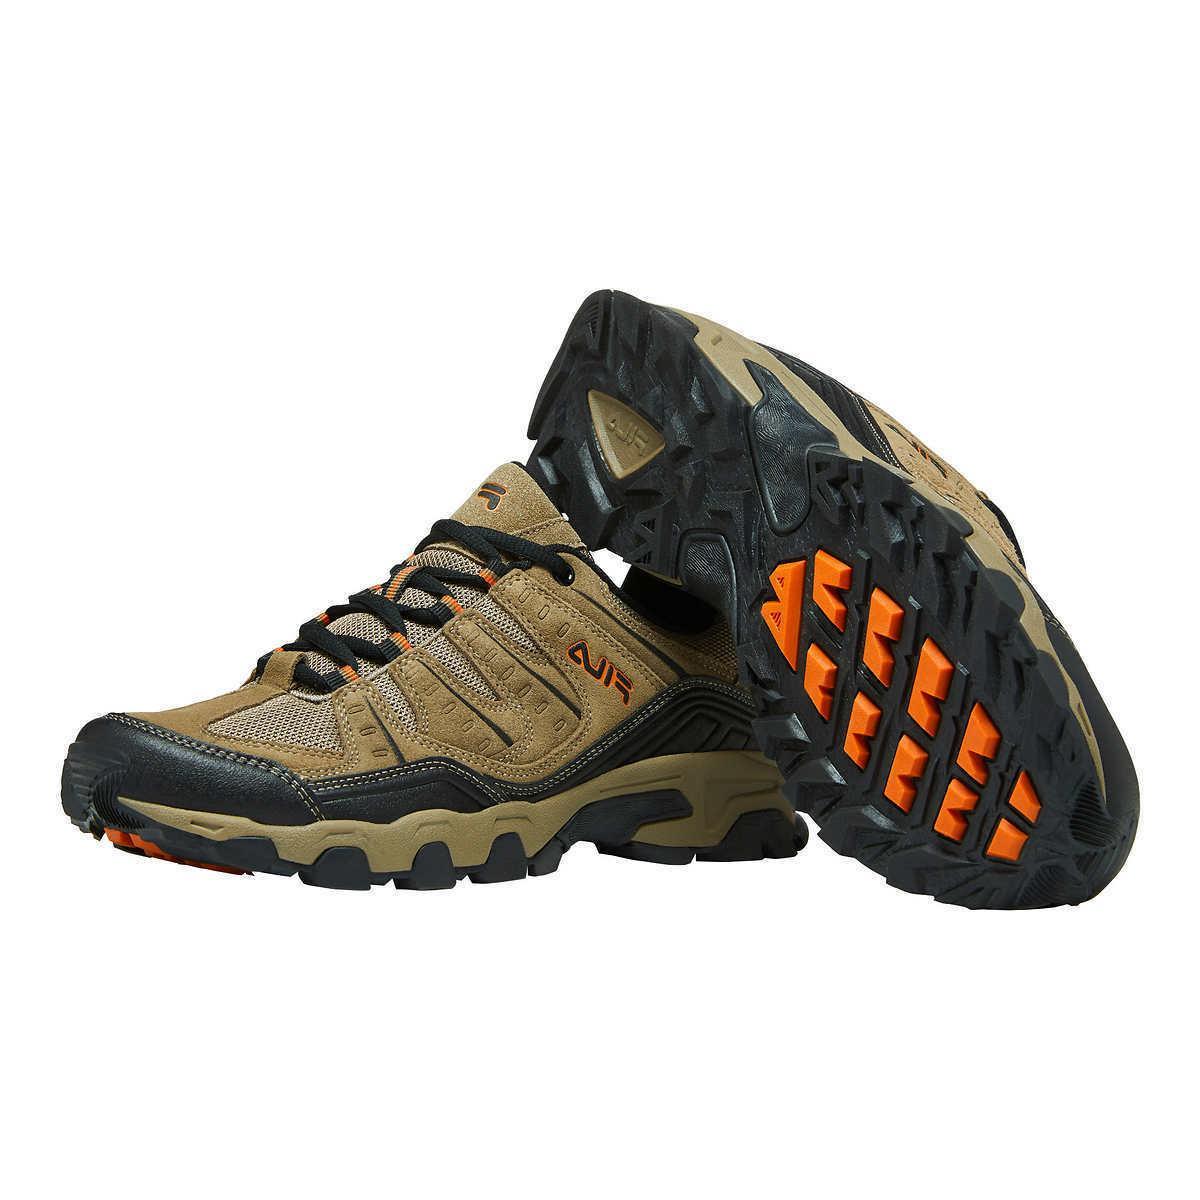 mens midland trail outdoor hiking trekking shoe